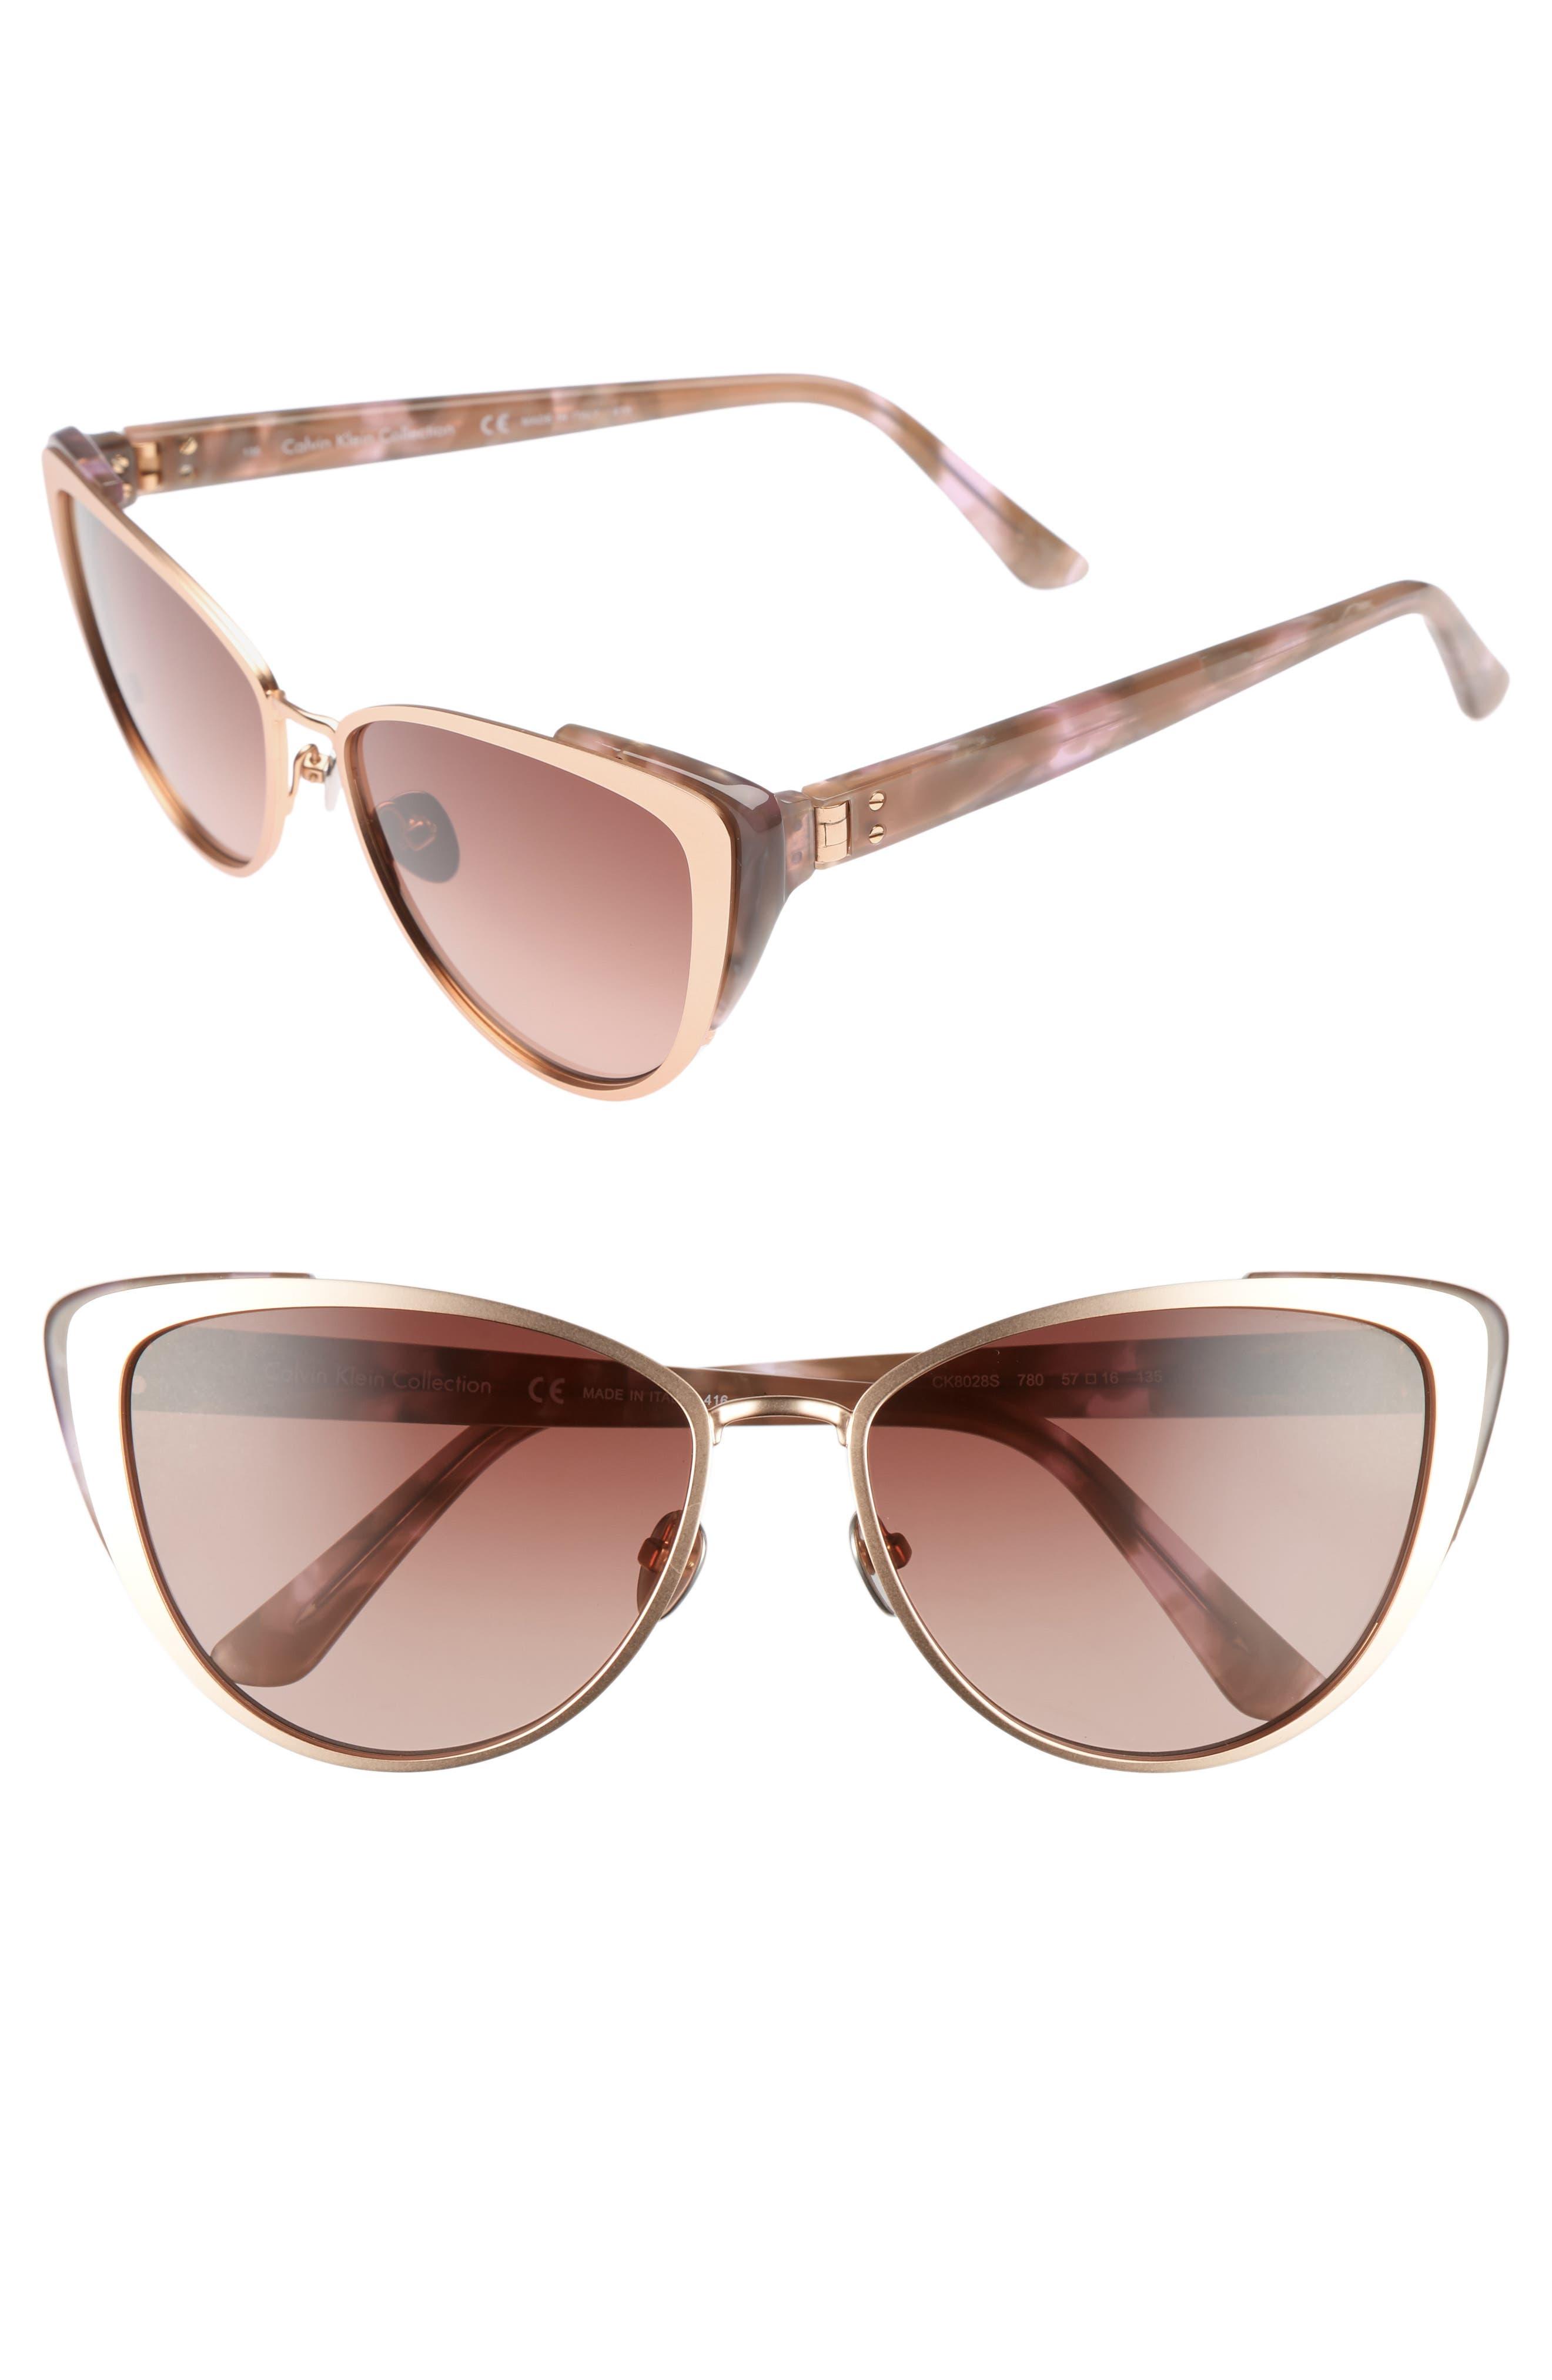 Main Image - CALVIN KLEIN 57mm Cat Eye Sunglasses